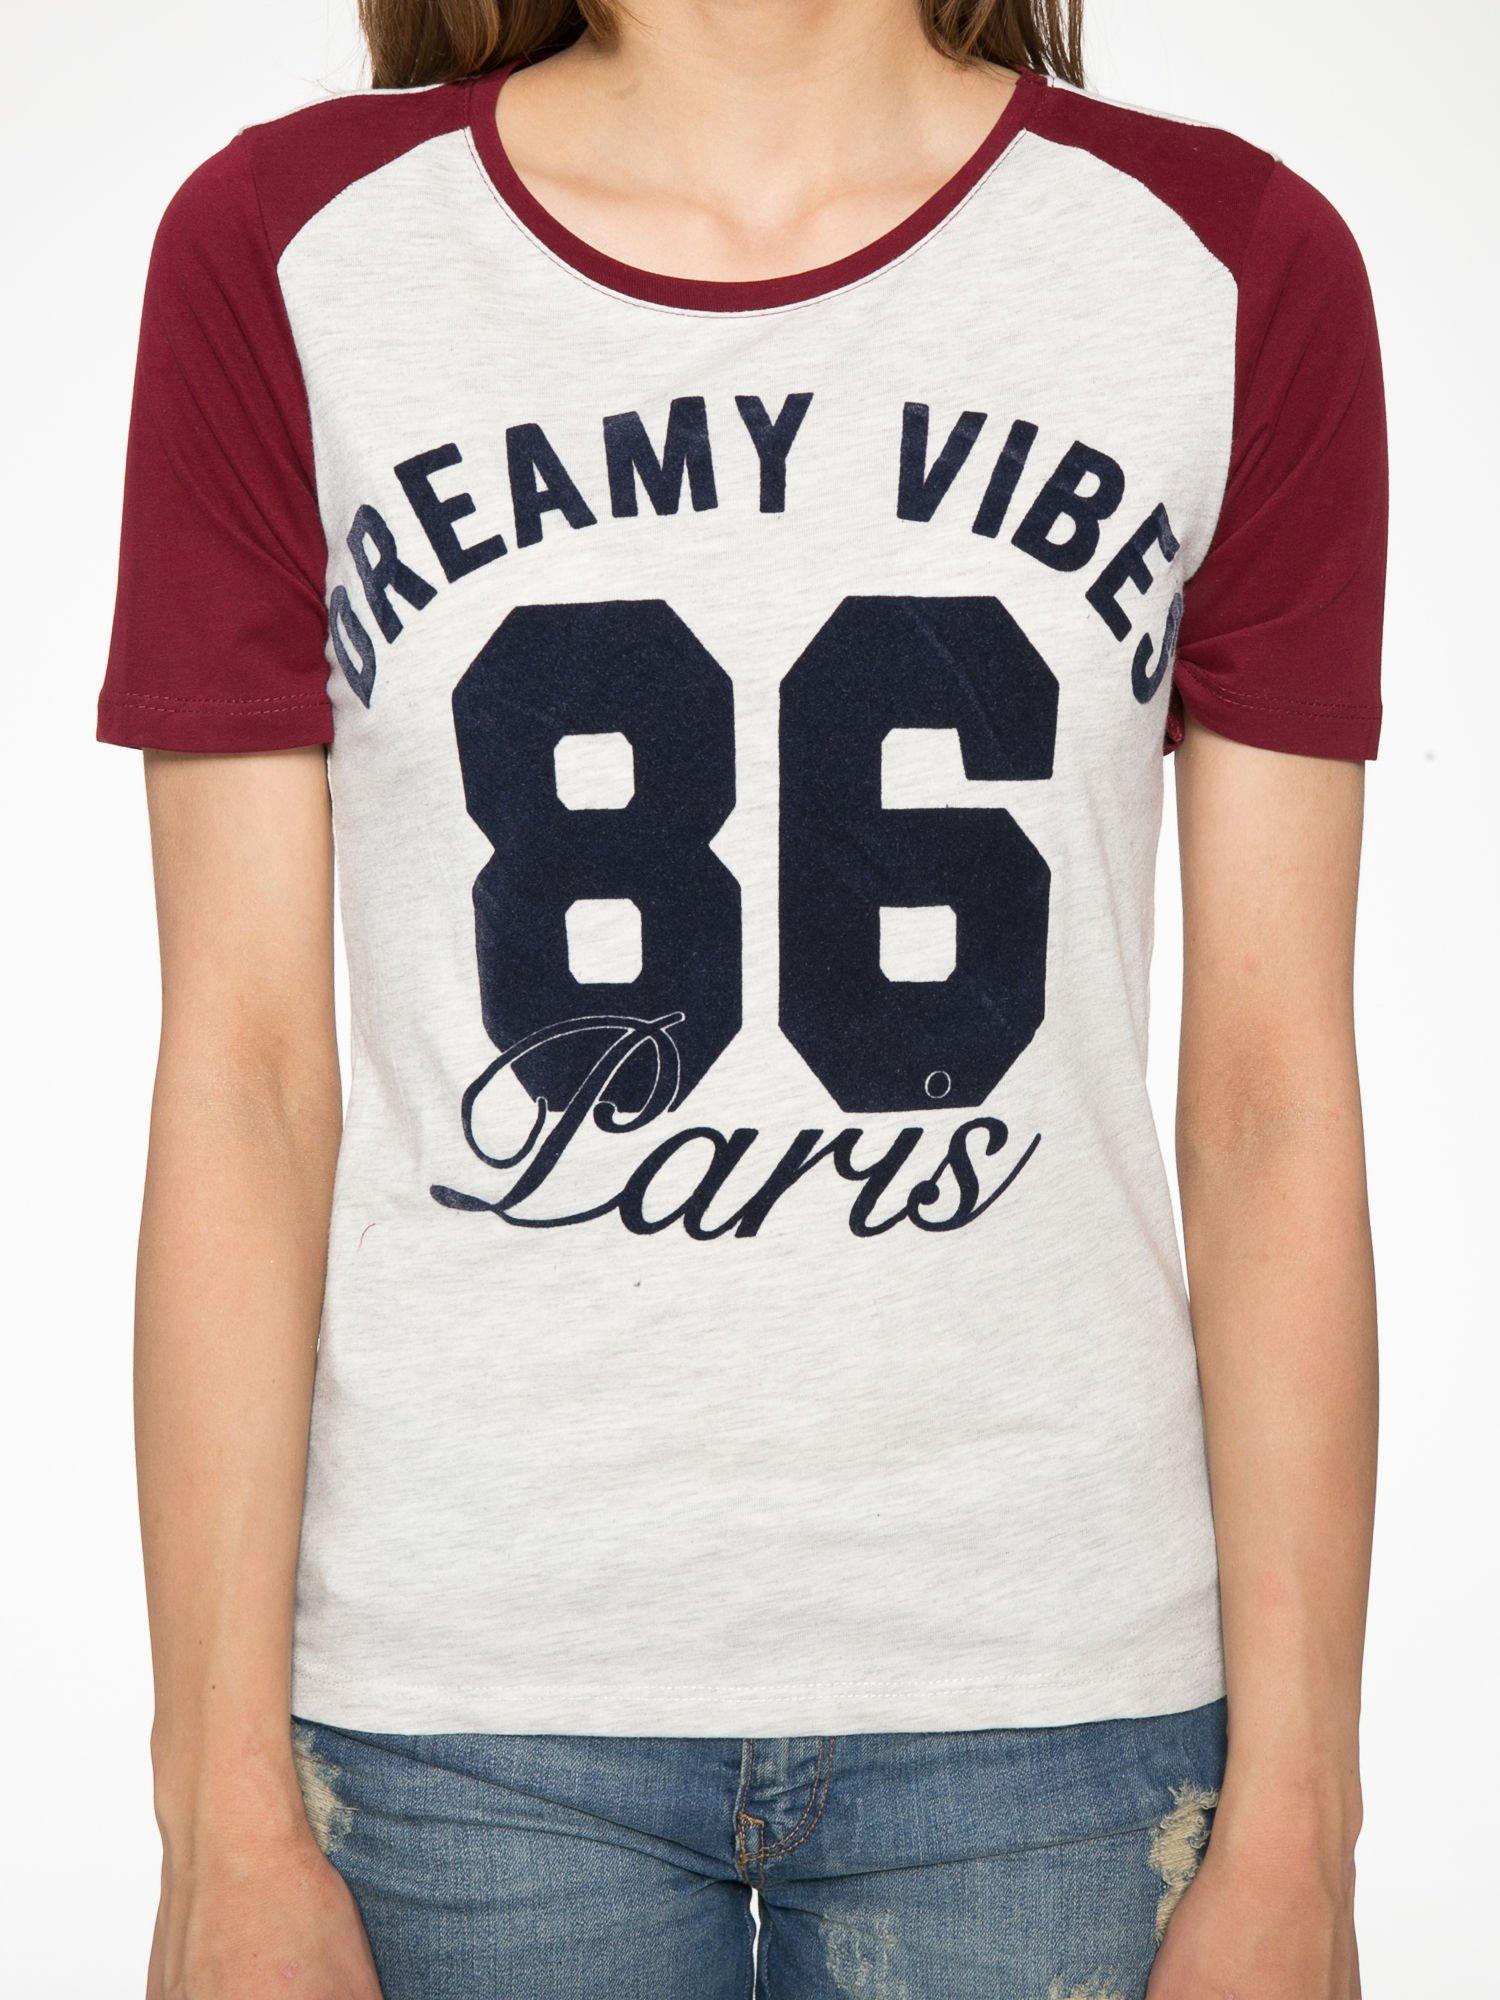 Szaro-bordowy t-shirt z napisem DREAMY VIBES 86 PARIS                                  zdj.                                  7